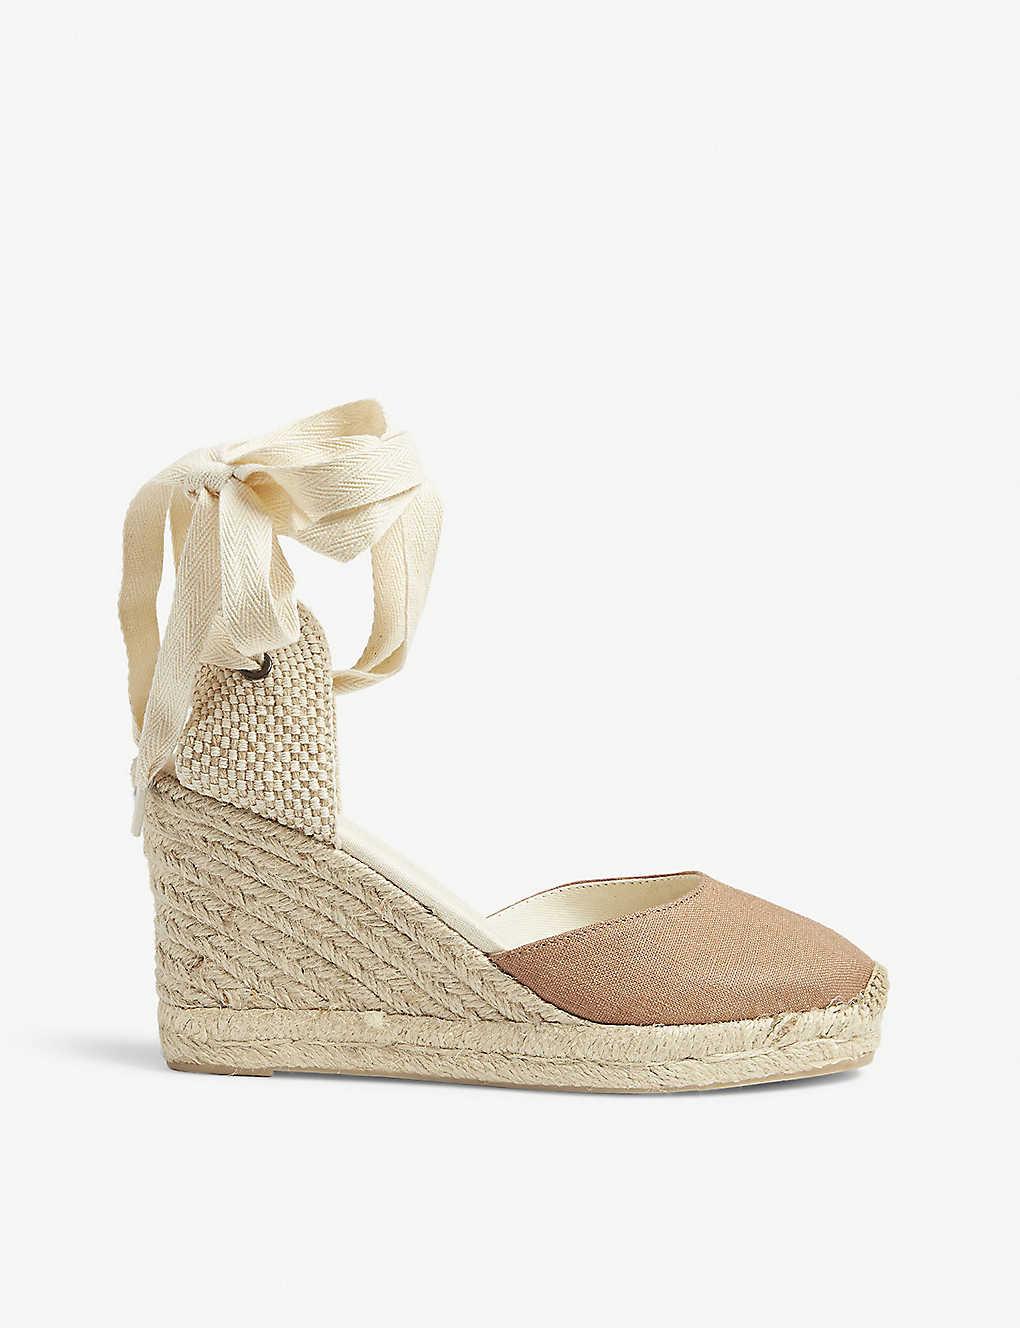 a45c37cb77c SOLUDOS - Linen woven wedge sandals | Selfridges.com